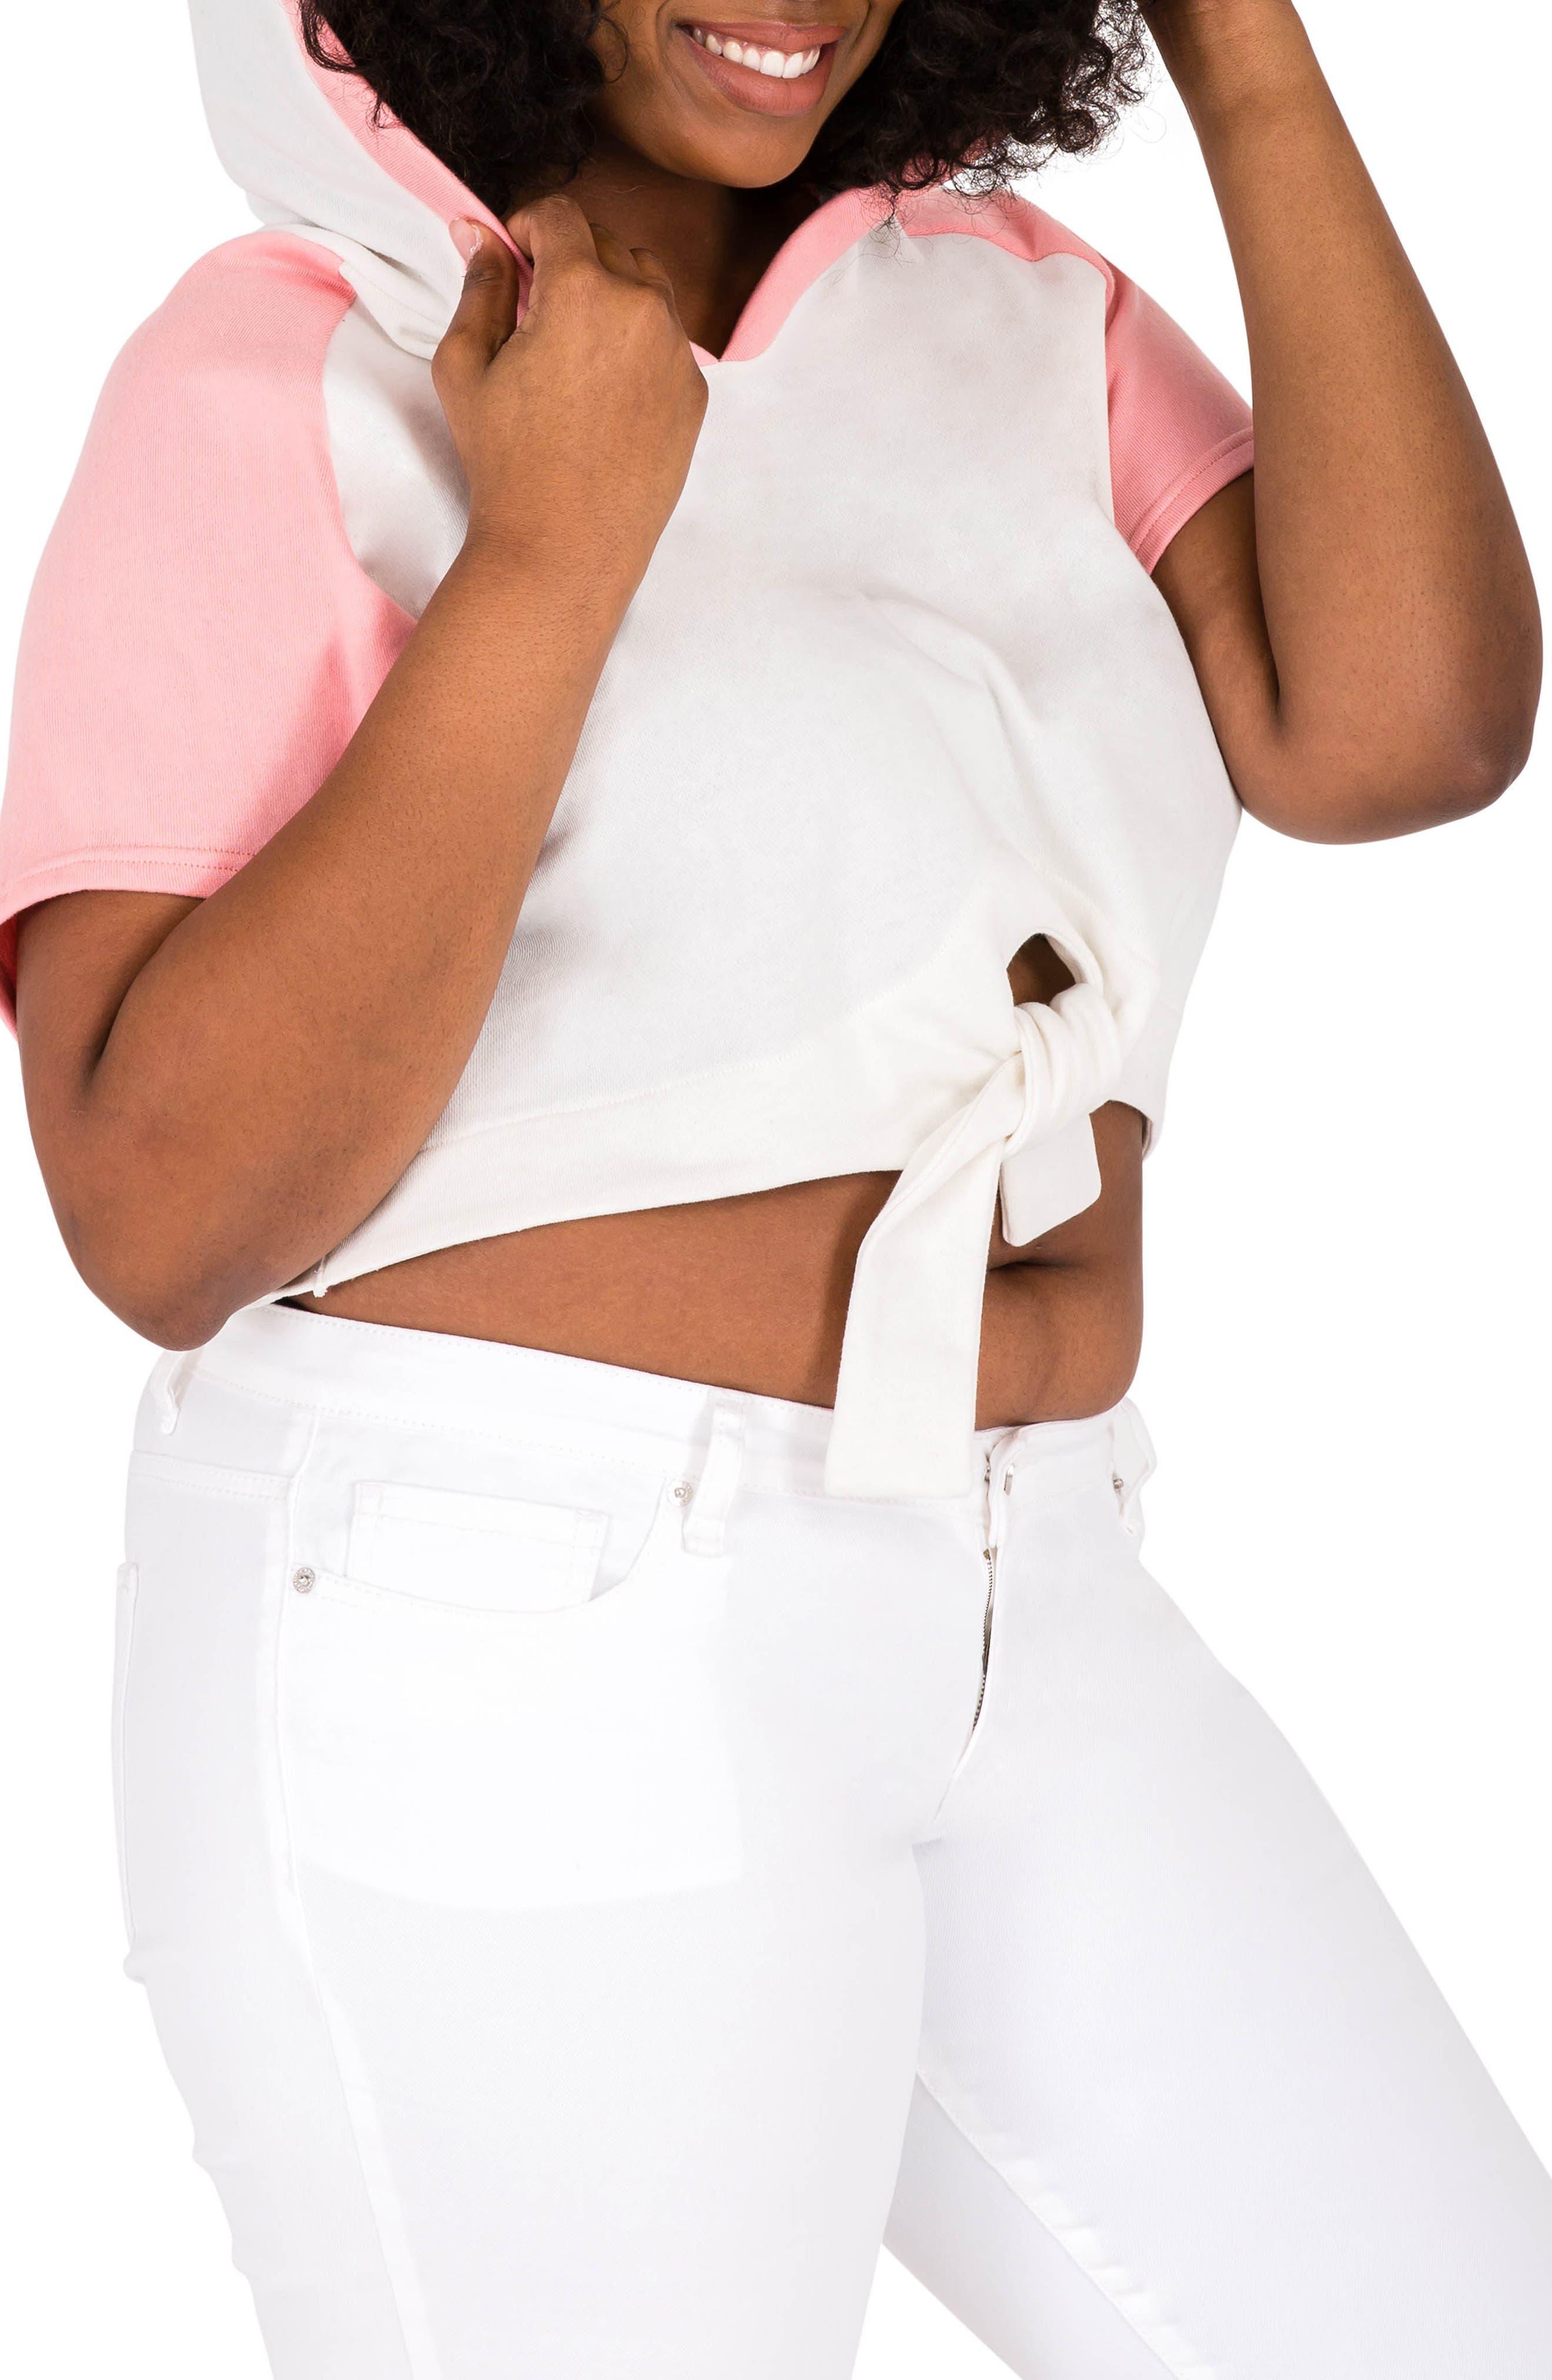 Ashira Hoodie Top,                             Main thumbnail 1, color,                             White And Pink